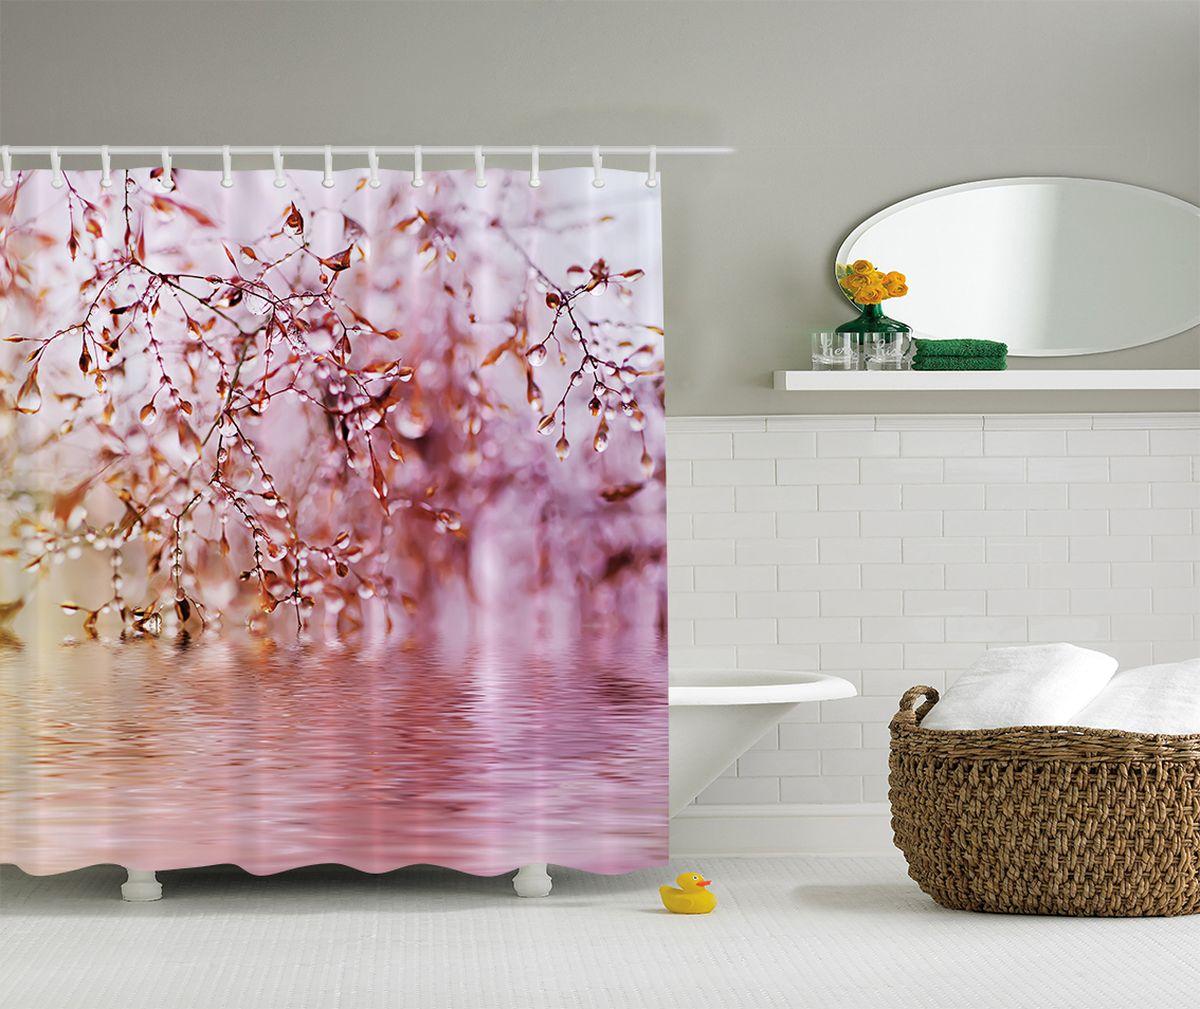 Штора для ванной комнаты Magic Lady Капли дождя, 180 х 200 см штора для ванной комнаты magic lady разноцветные бабочки 180 х 200 см